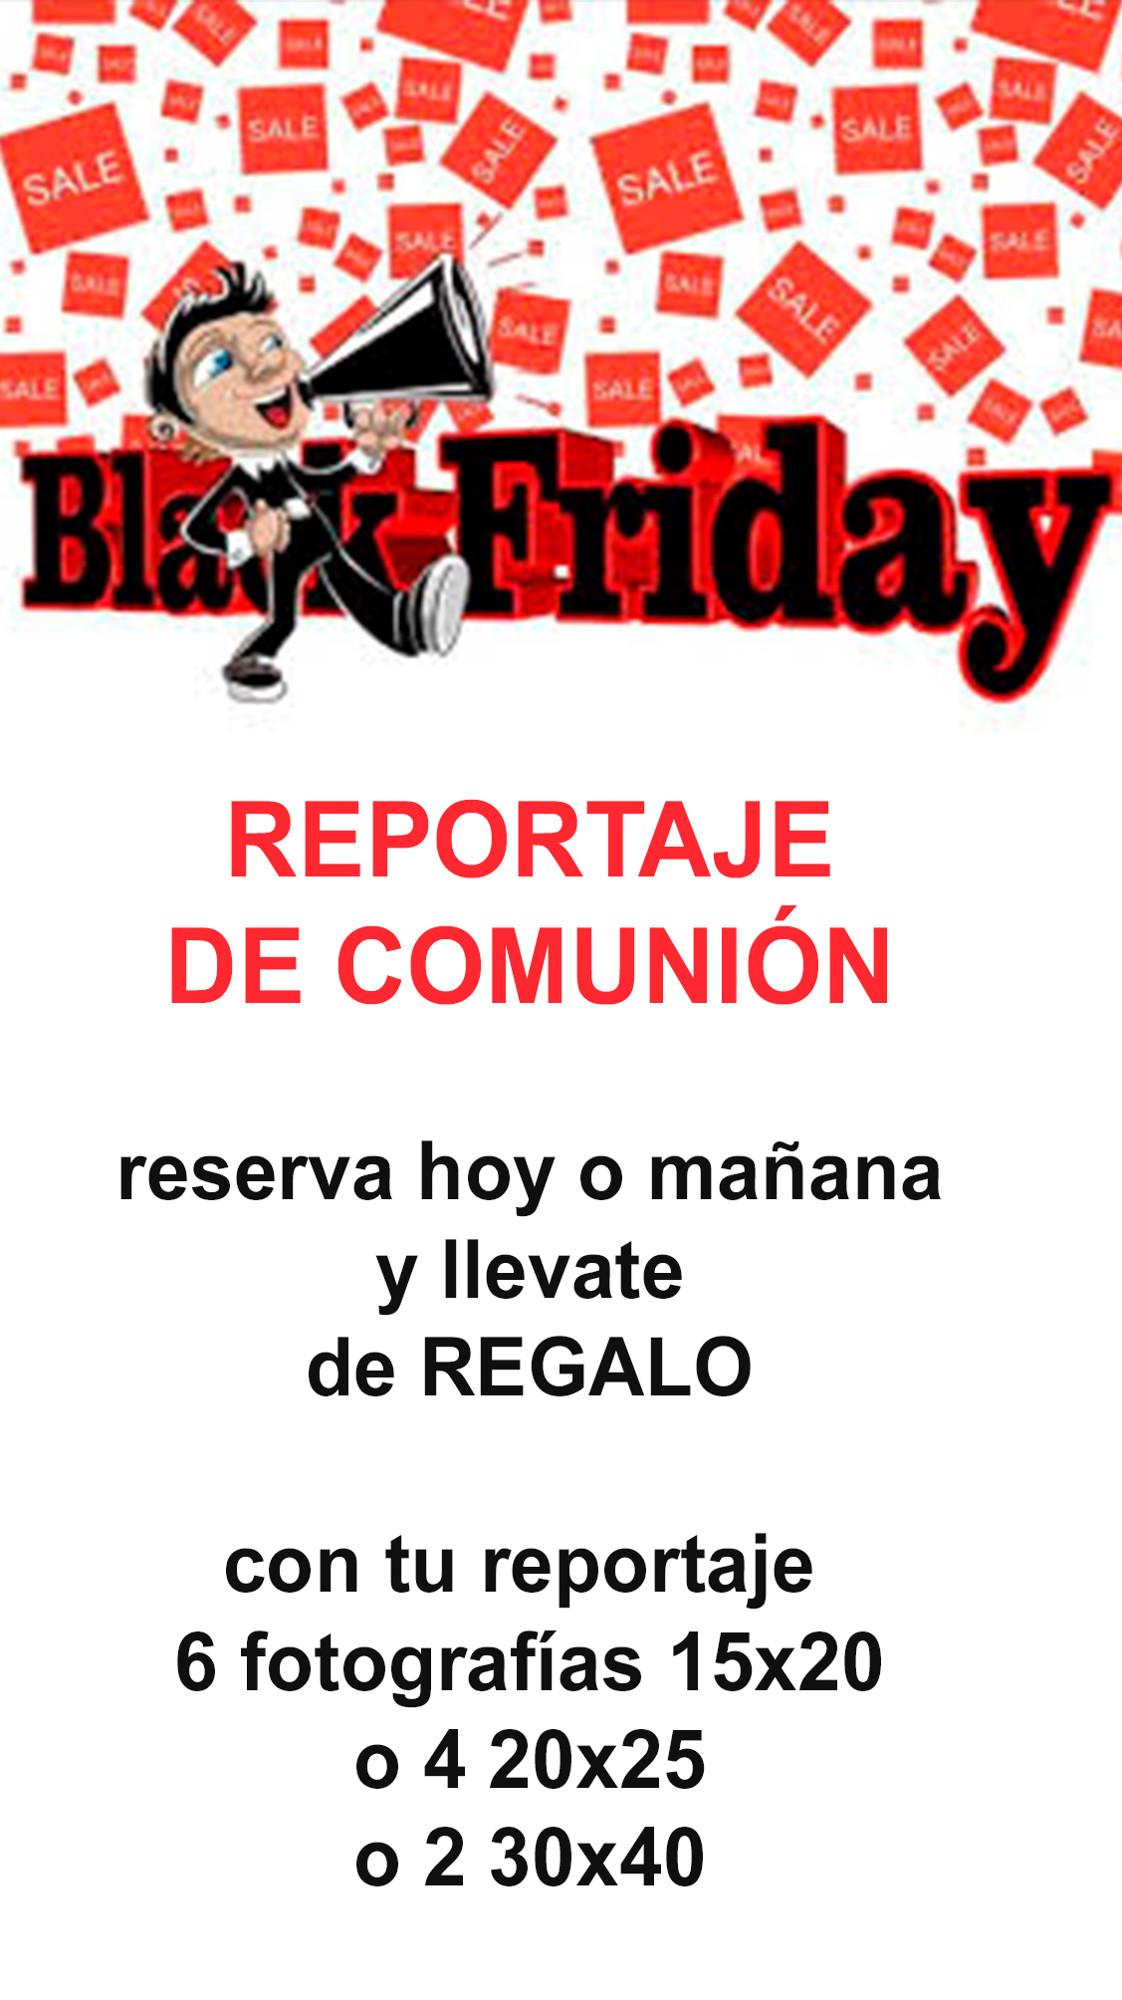 black fr